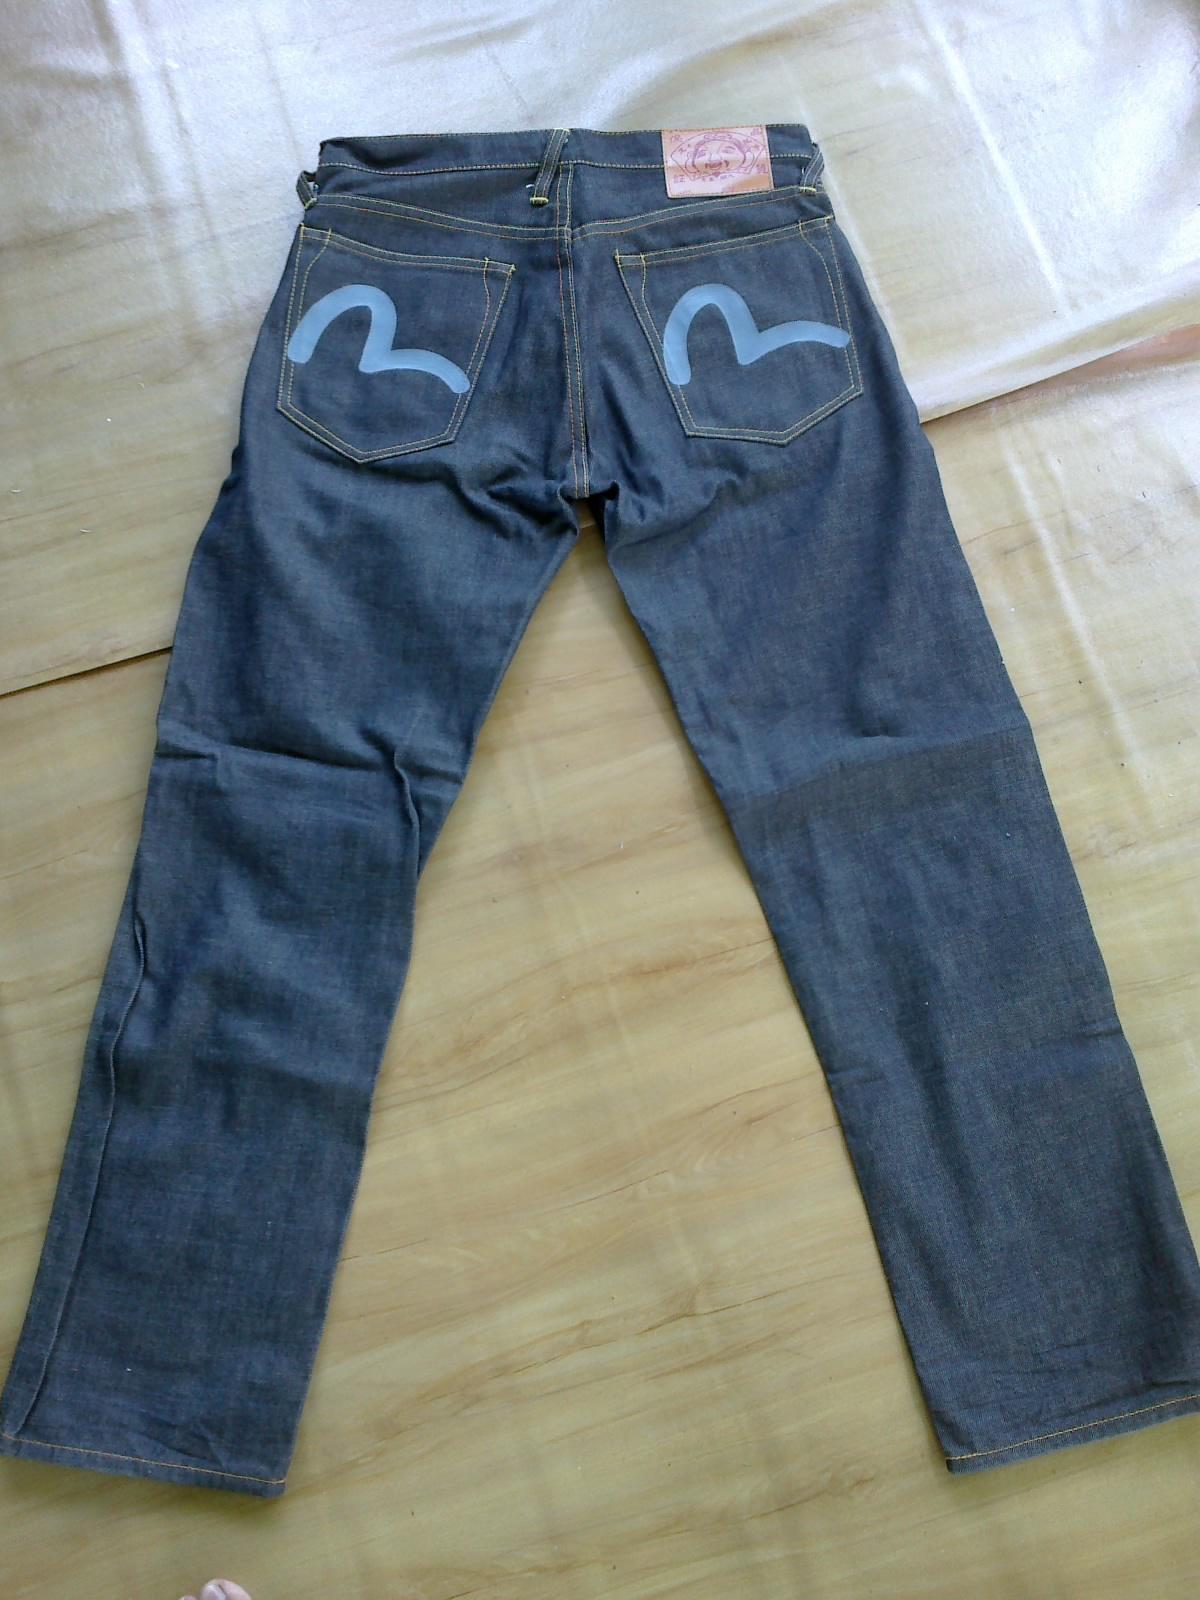 Bundle Selamanya Andrew Smith Regular Fit Jeans Biru 31 Evisu Jeanssold